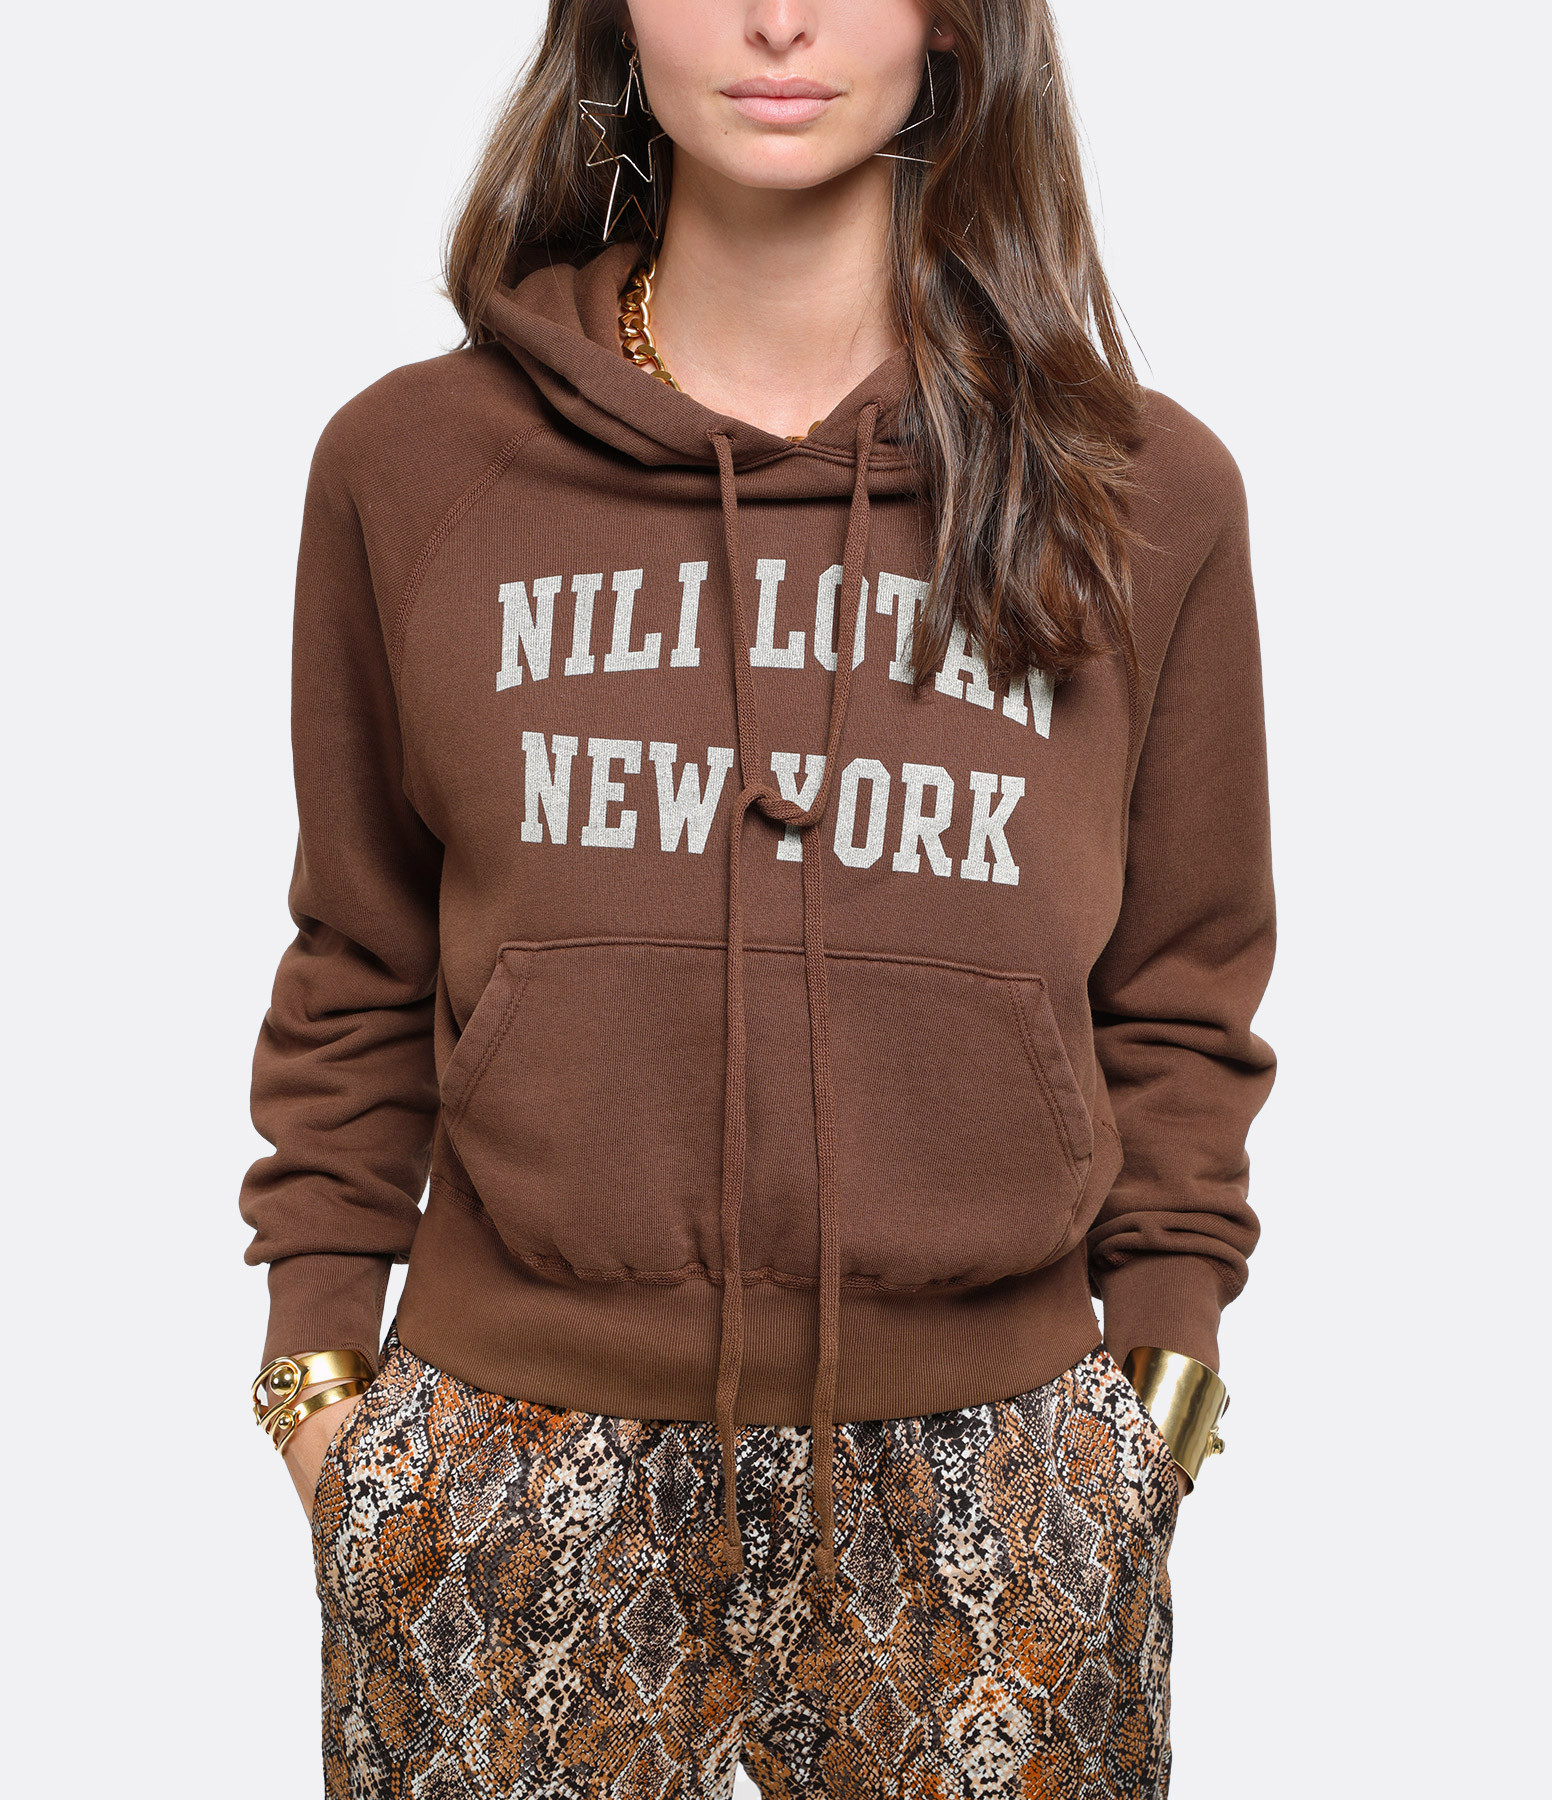 NILI LOTAN - Sweatshirt Nili Lotan New-York Imprimé Marron